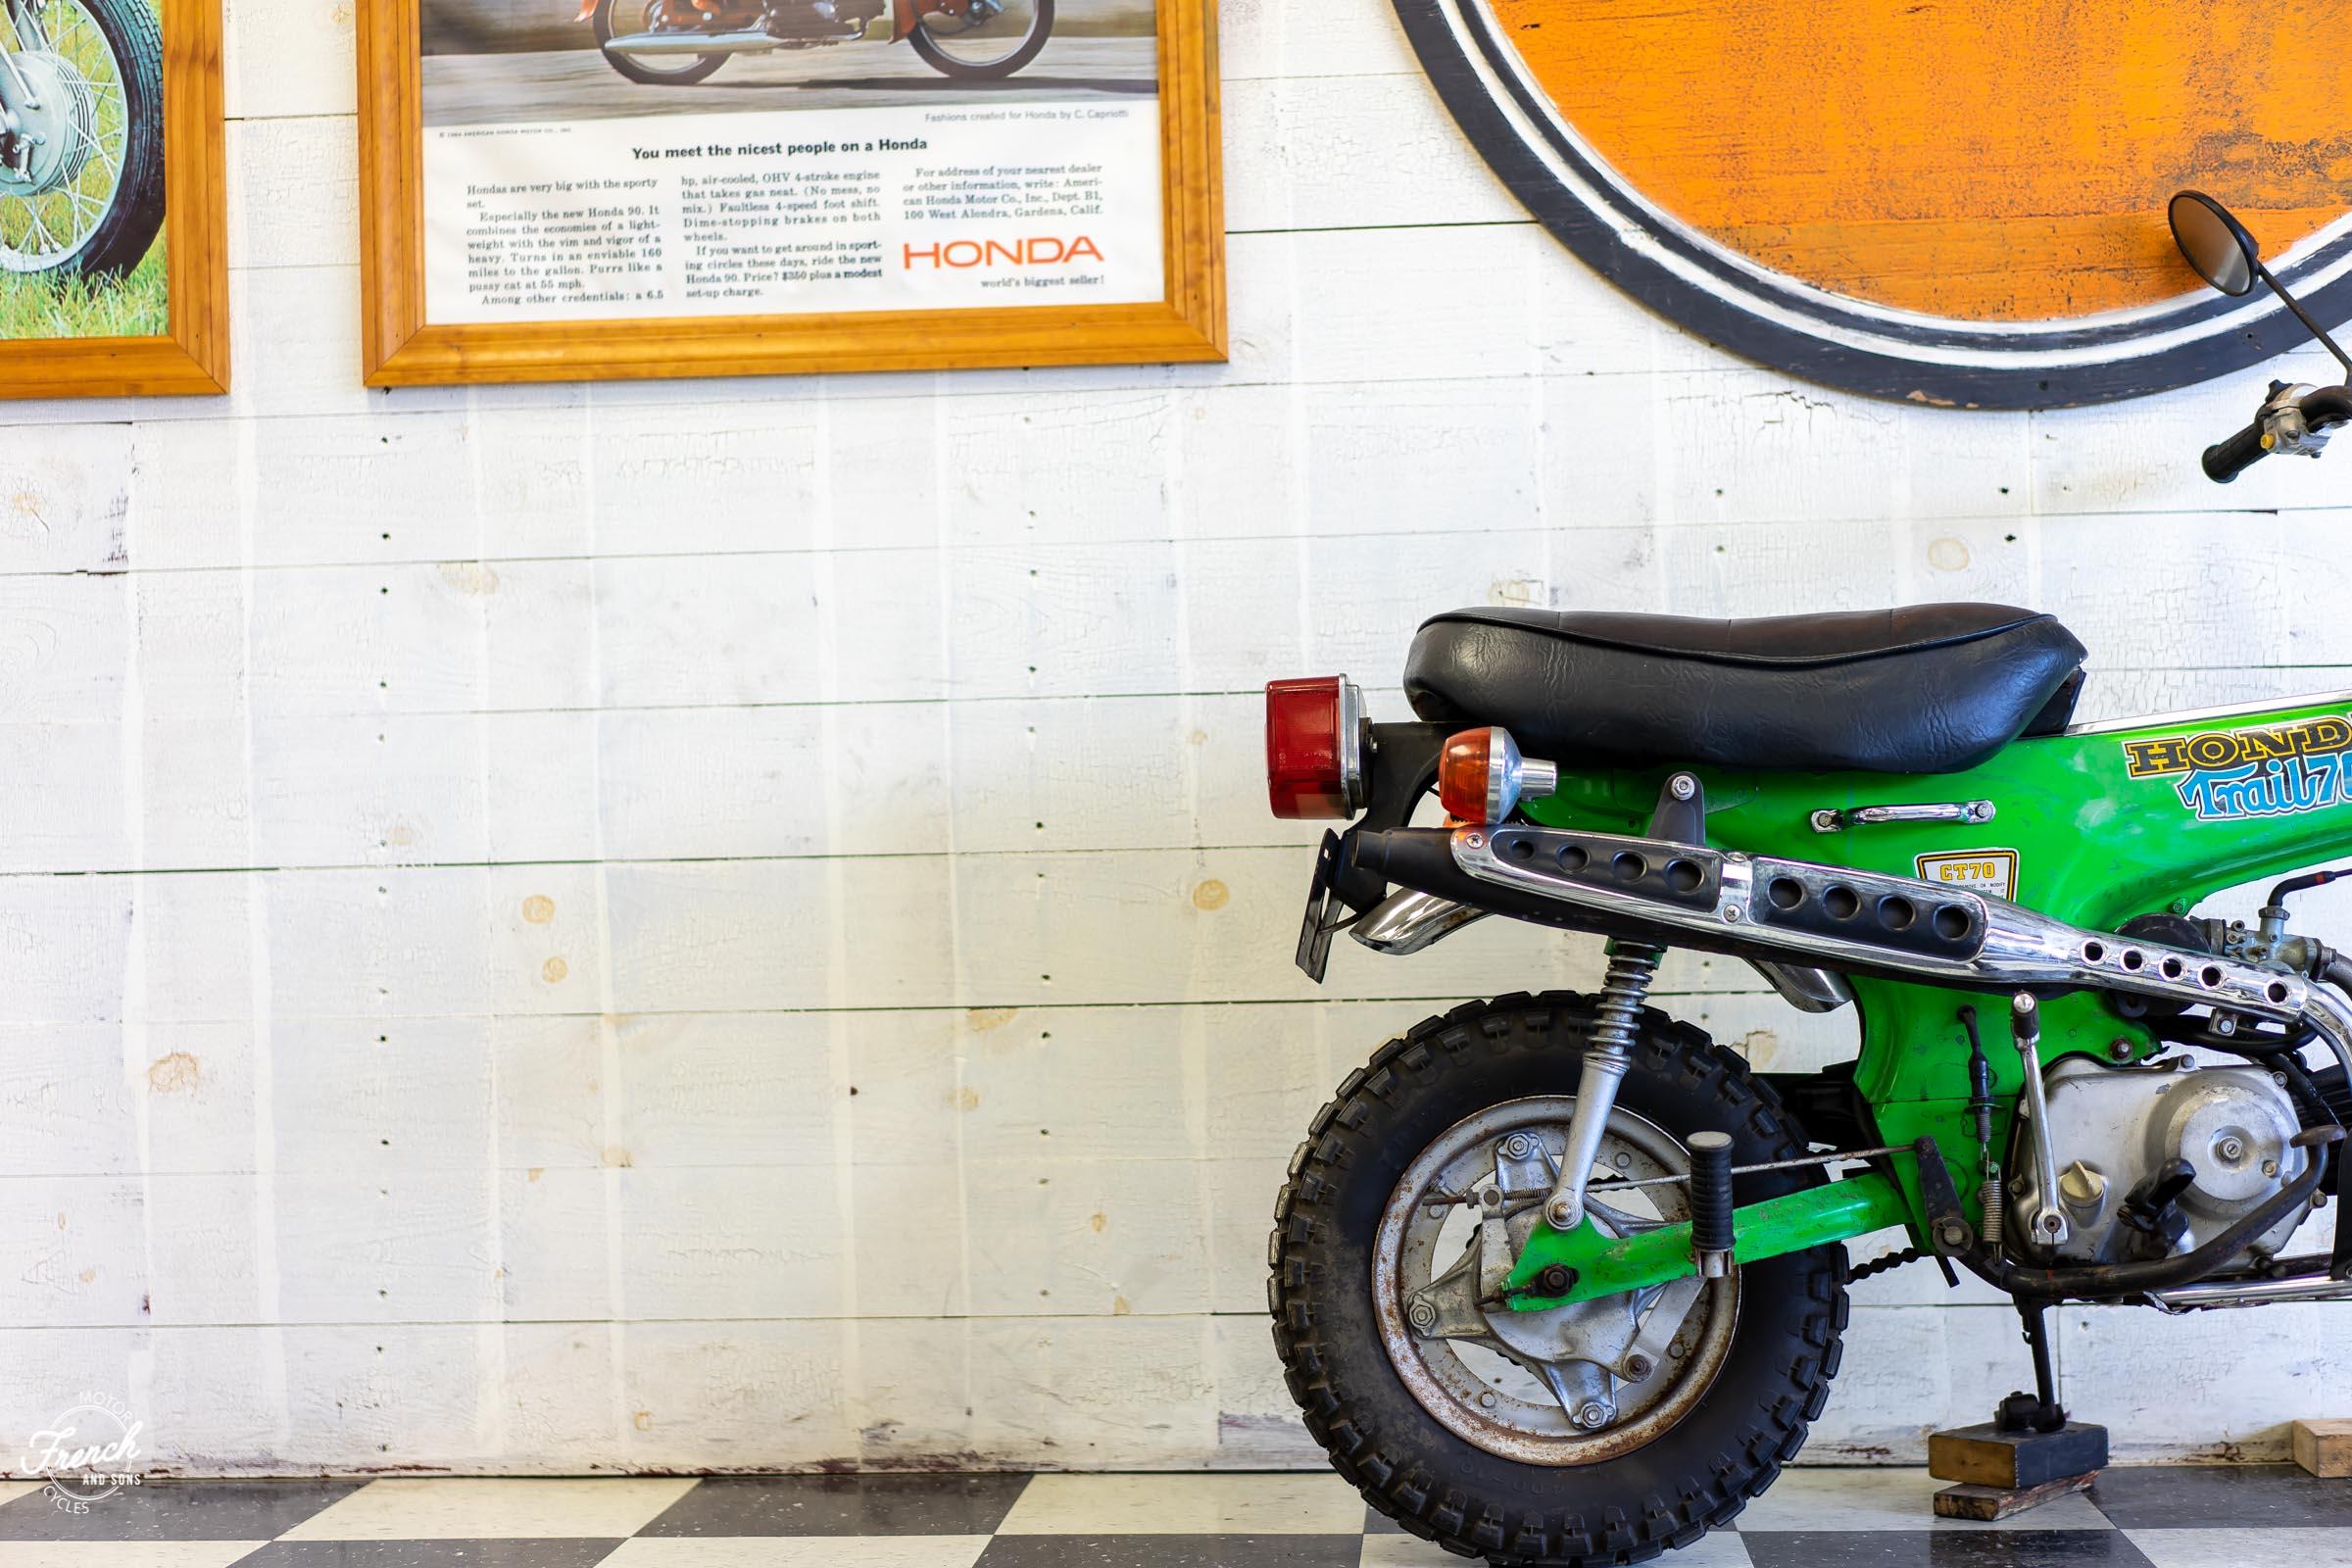 1975hondact70green-3.jpg